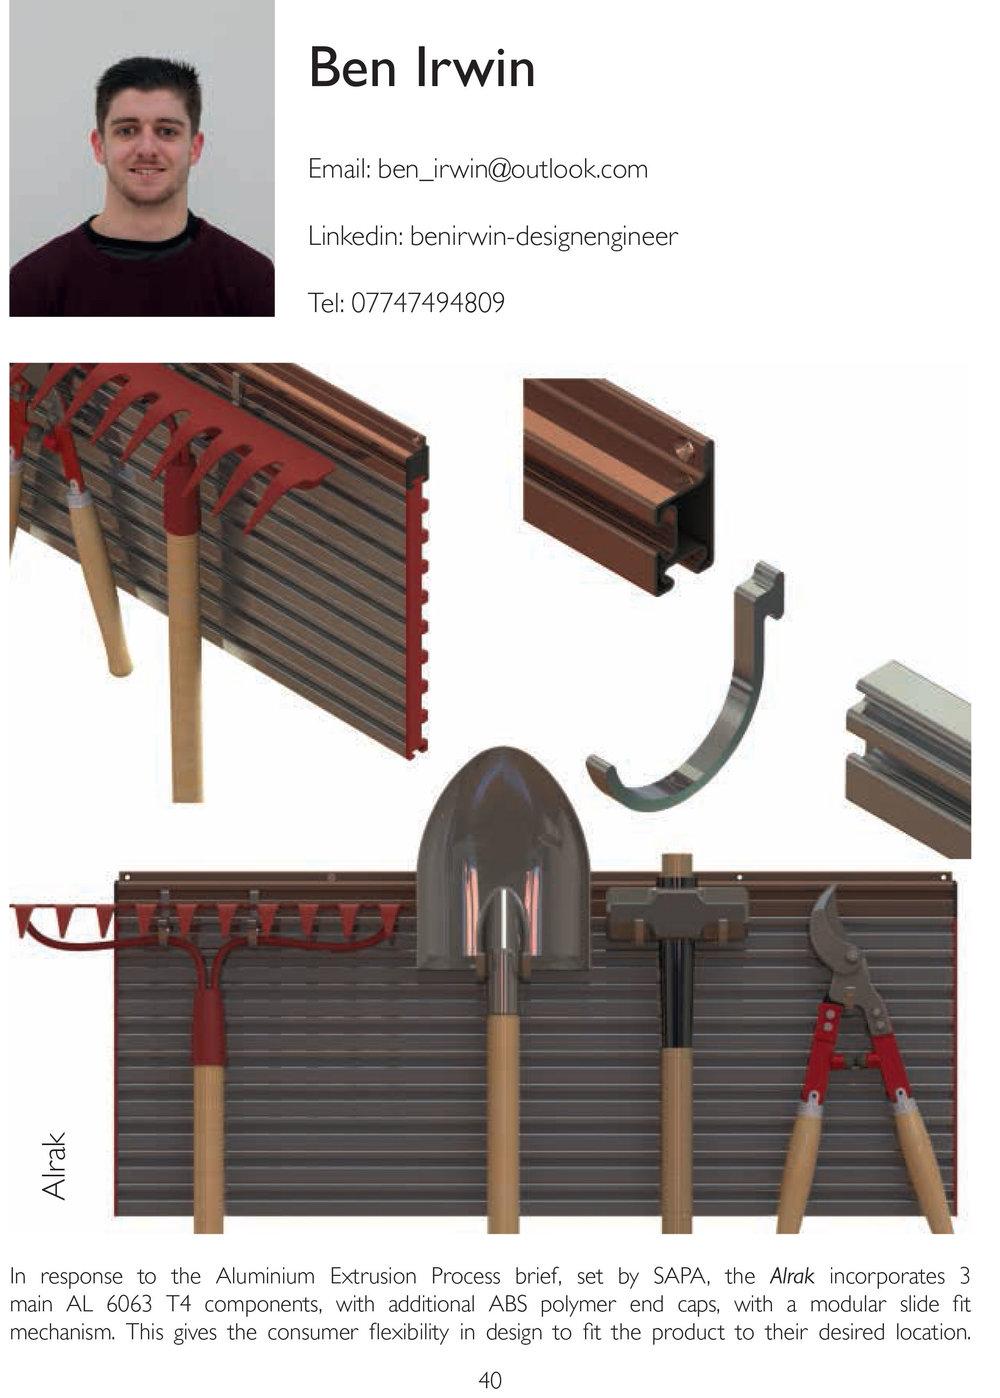 BSc Product Design - Brochure - NTU Degree Show 2017-42.jpg